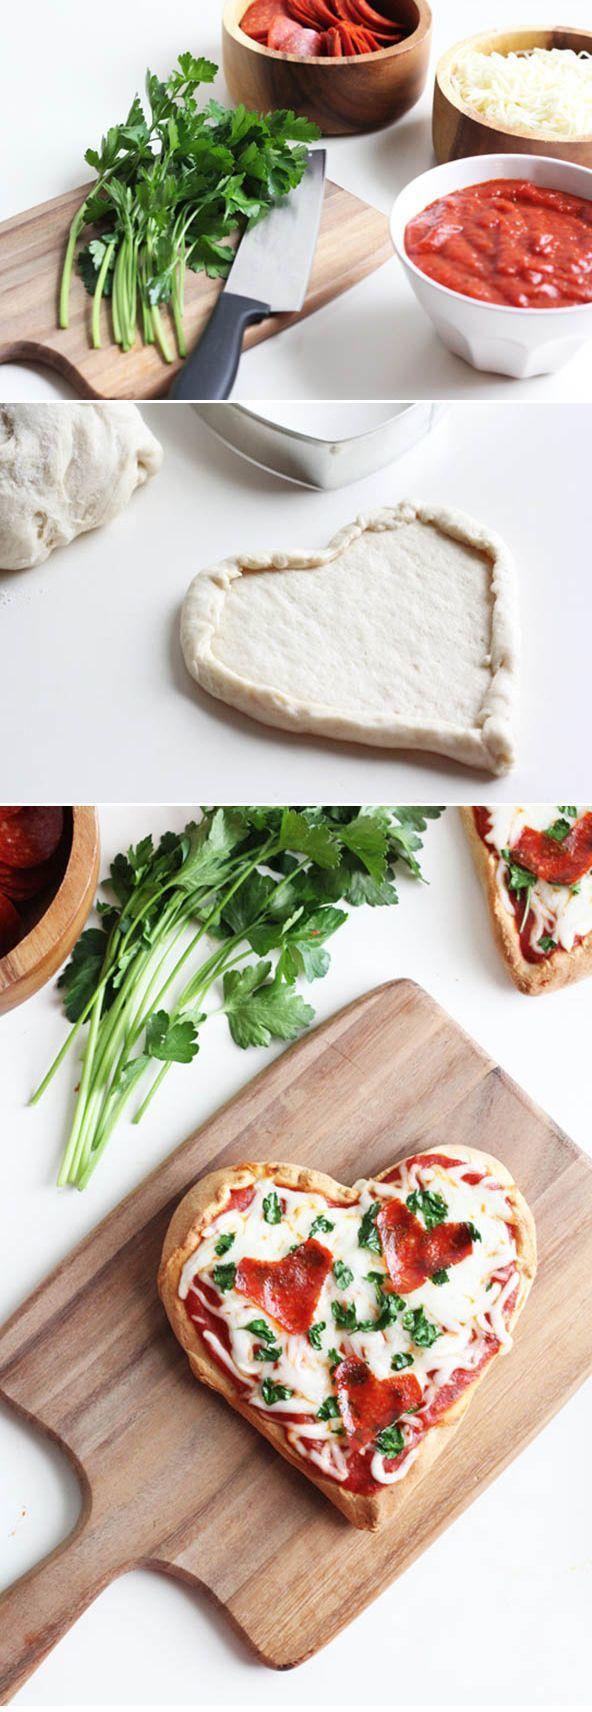 Homemade Heart Pizza | Valentine's Day Dinner Ideas